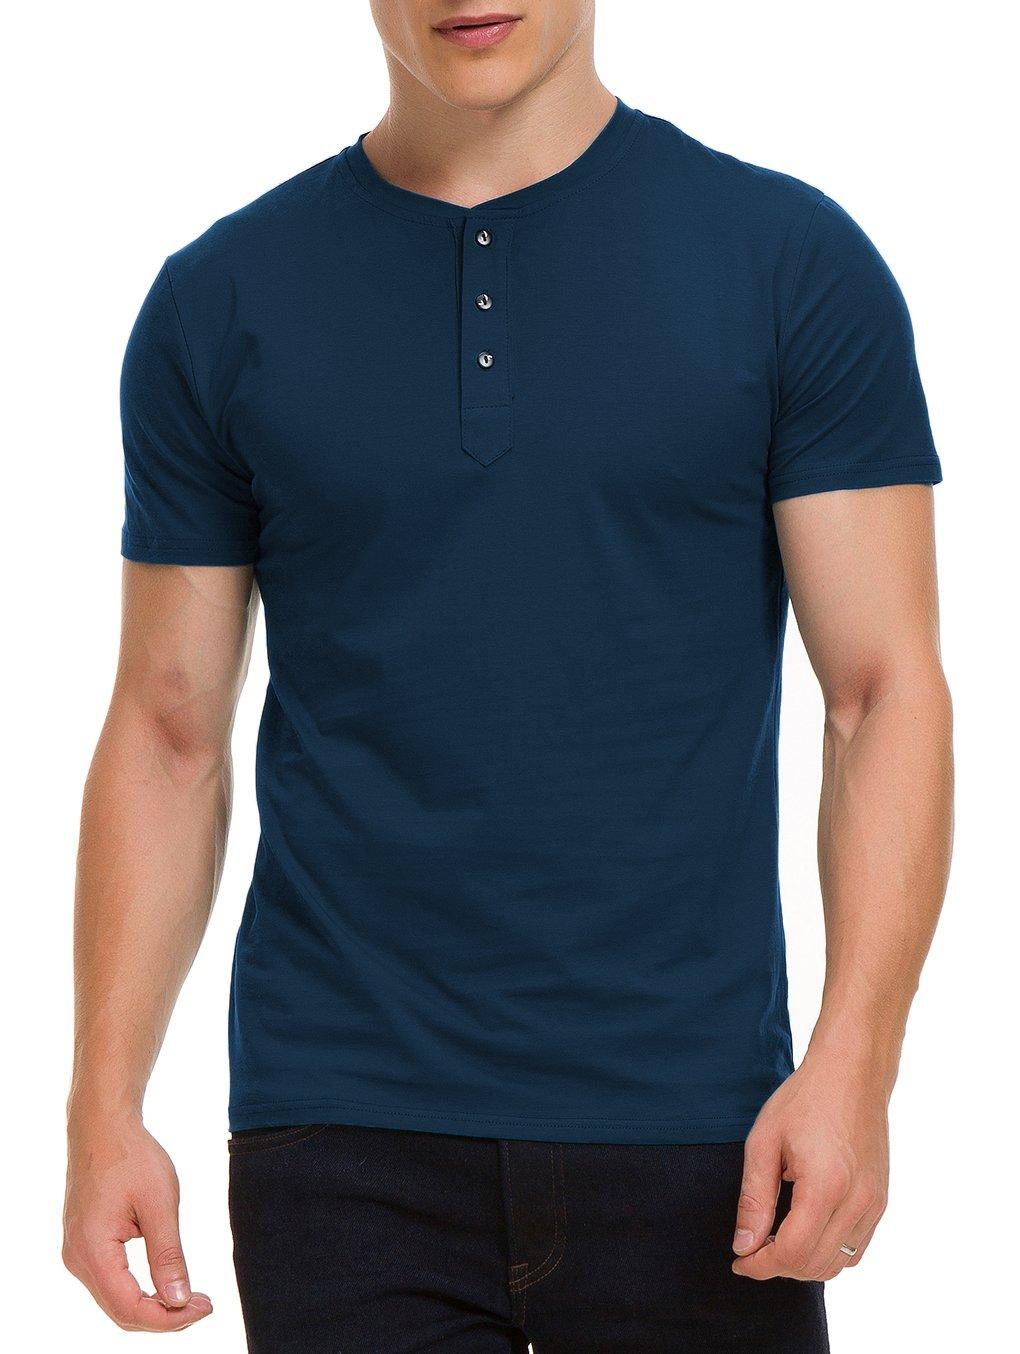 Boisouey Men's Casual Slim Fit Short Sleeve Henley T-Shirts Cotton Shirts Navyblue L